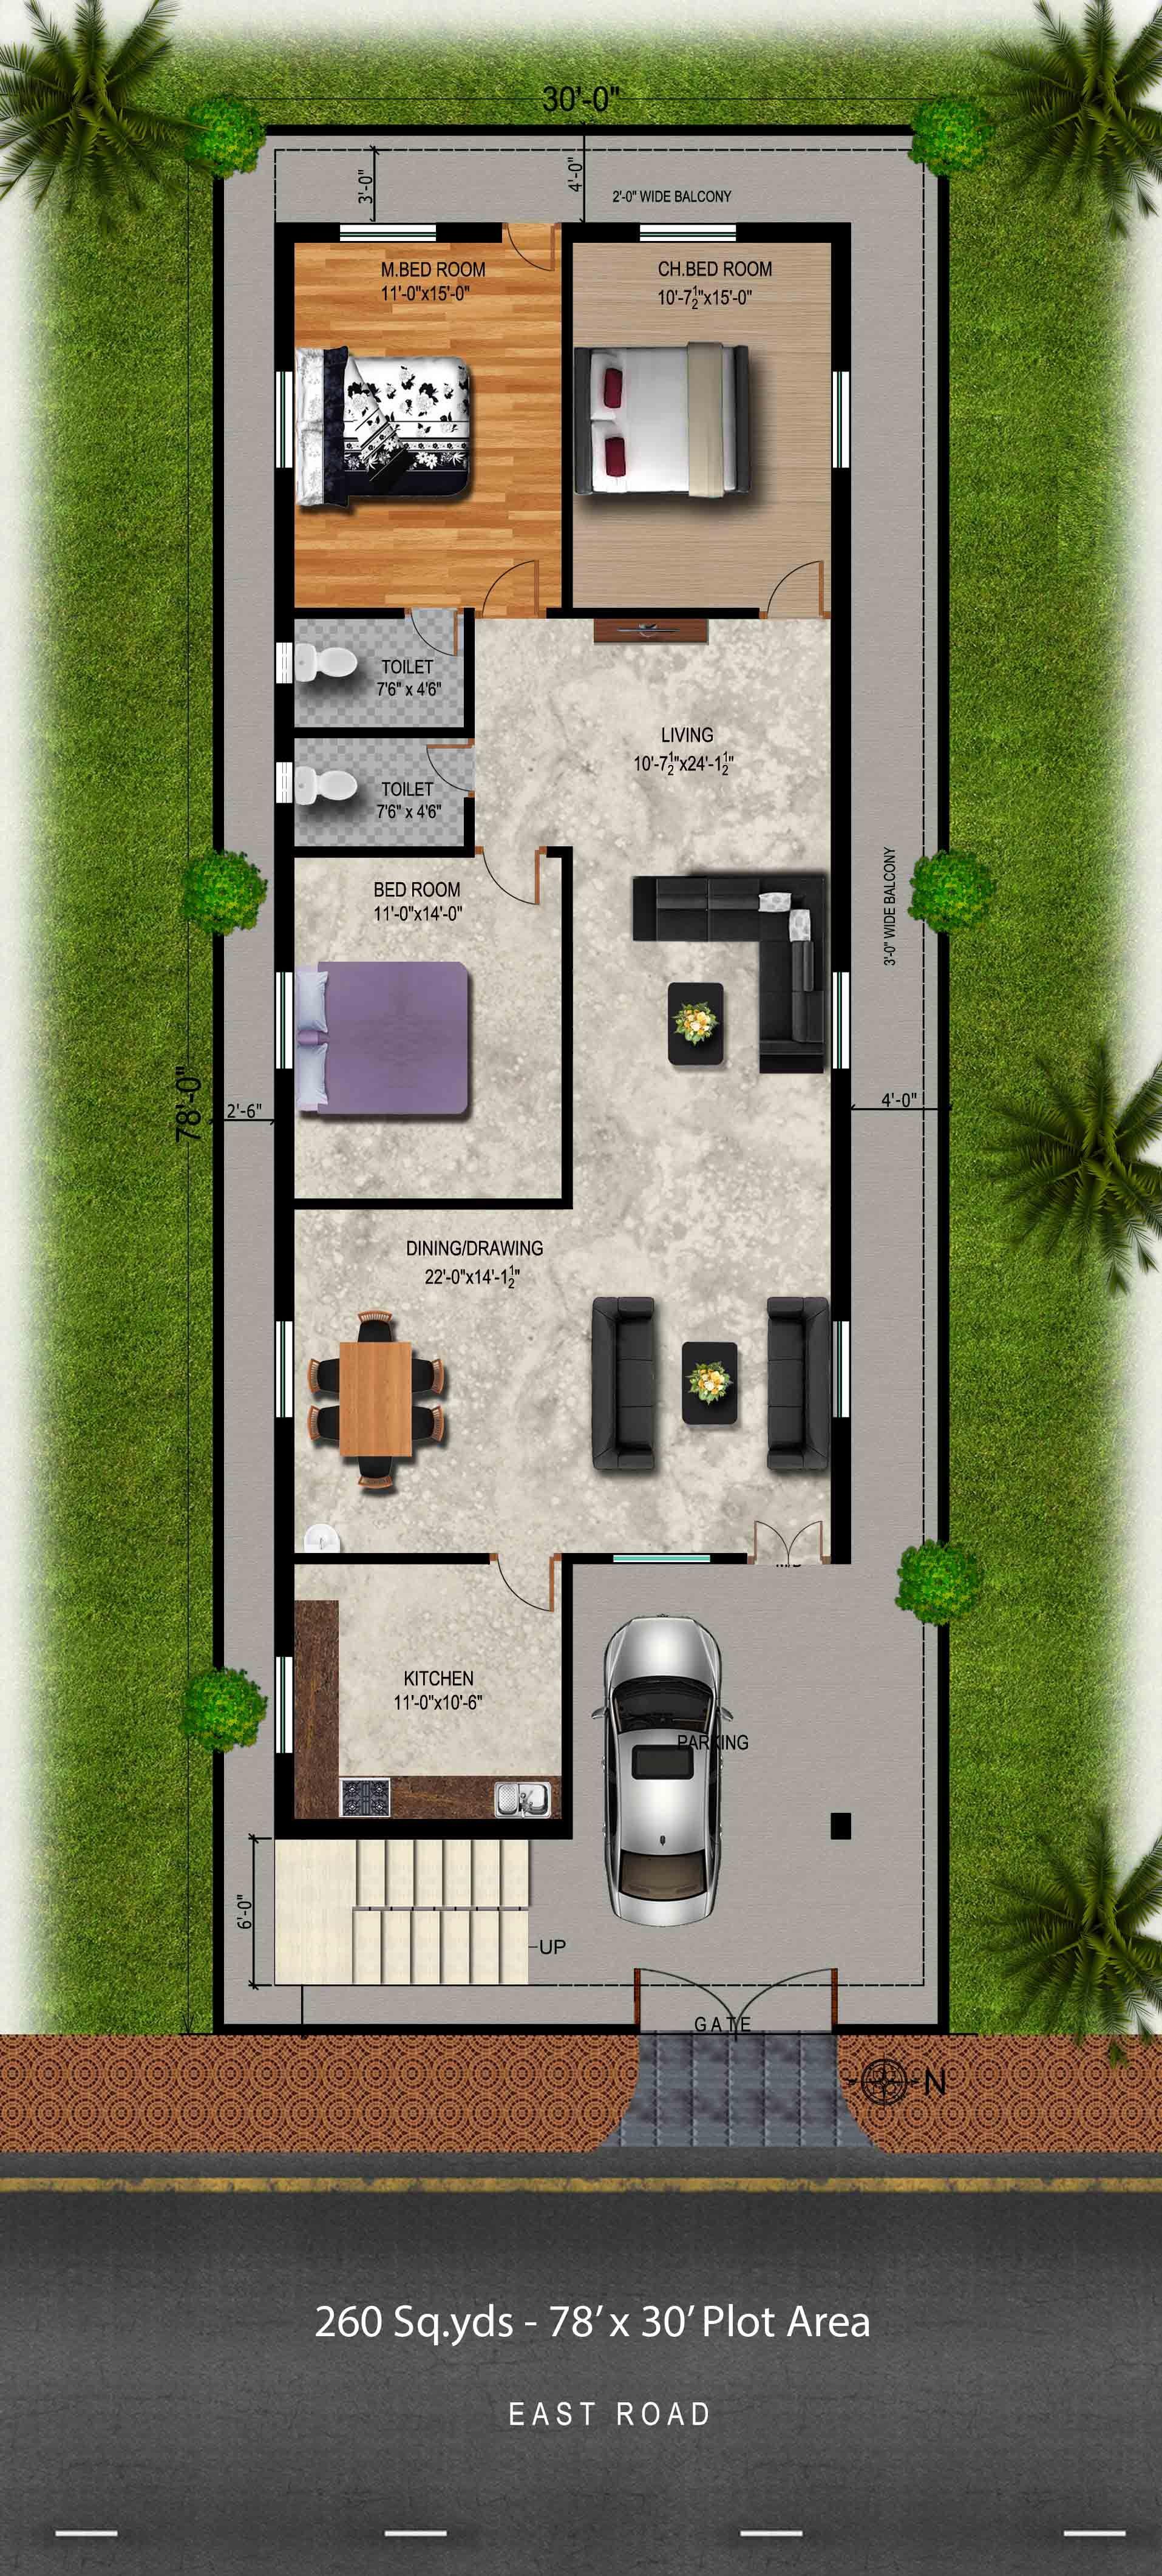 Home design plans indian style homelivings decor ideas also rahulsingh heisnam hbsingh hb on pinterest rh